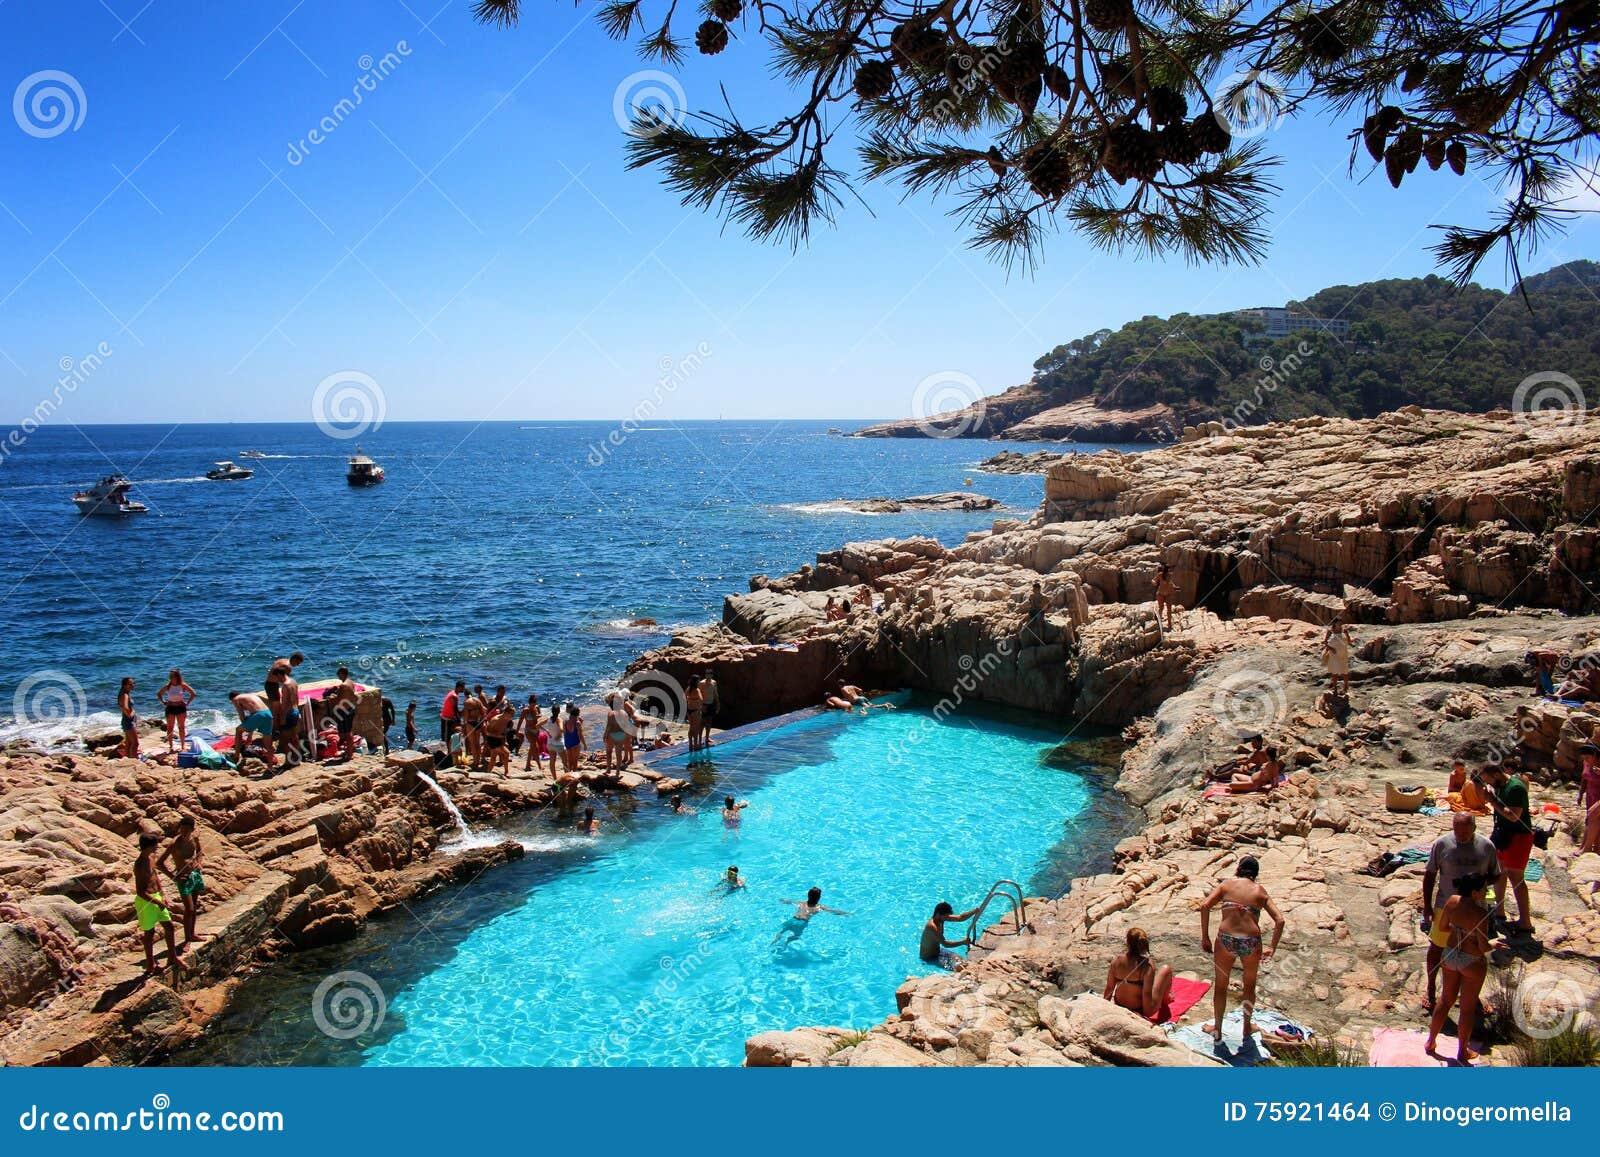 Natural Swimming Pool In Costa Brava Editorial Stock Image Image